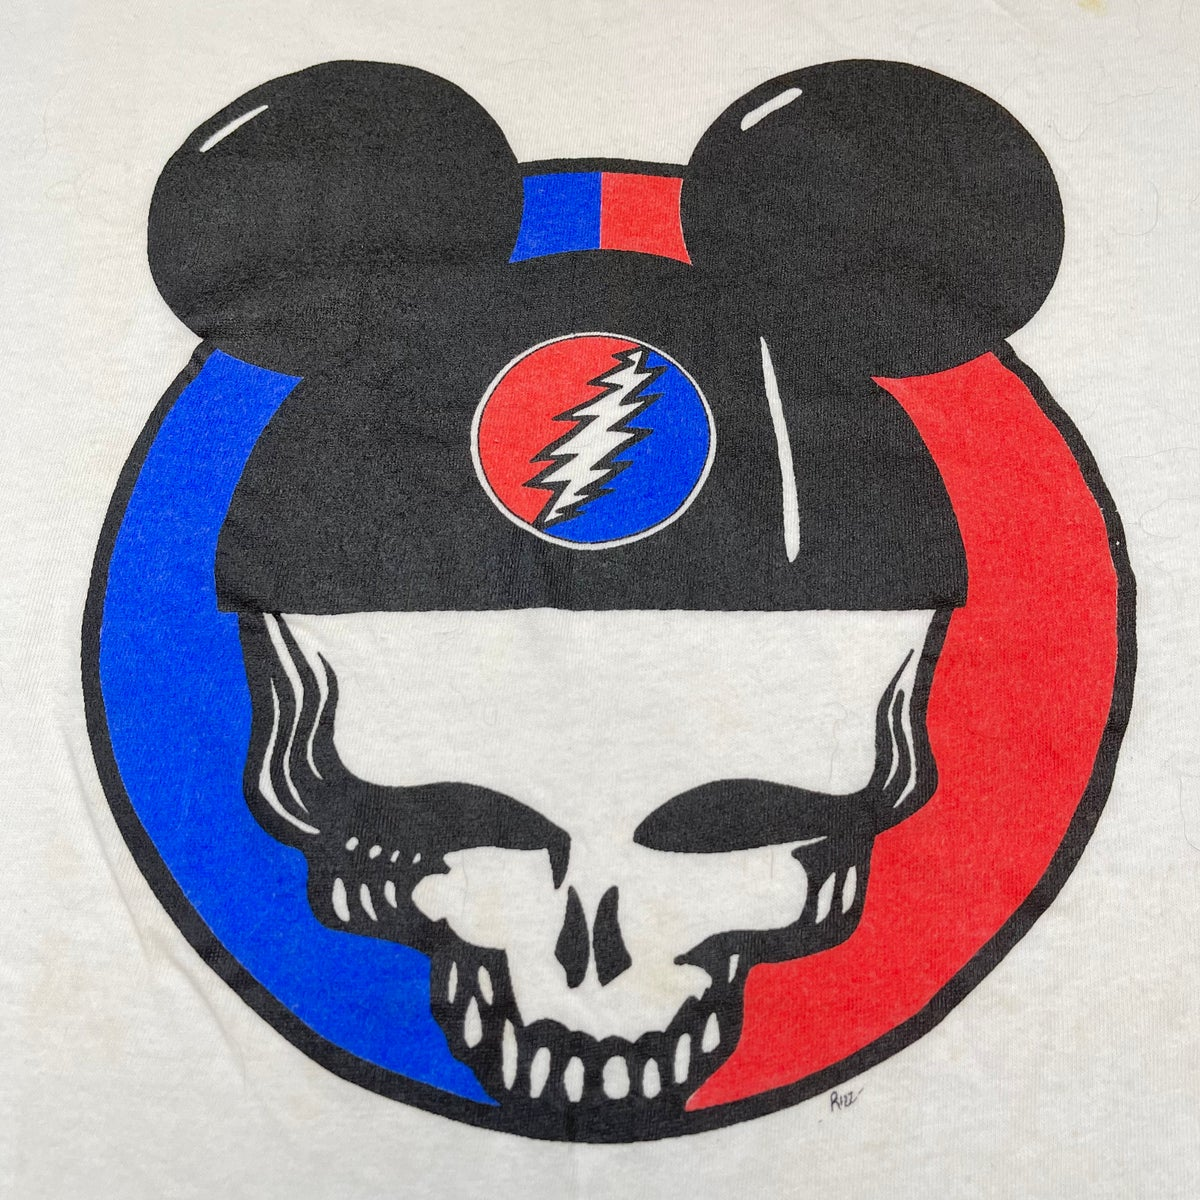 Original Vintage Grateful Dead 90's Mickey Mouse SYF Tee! - LARGE